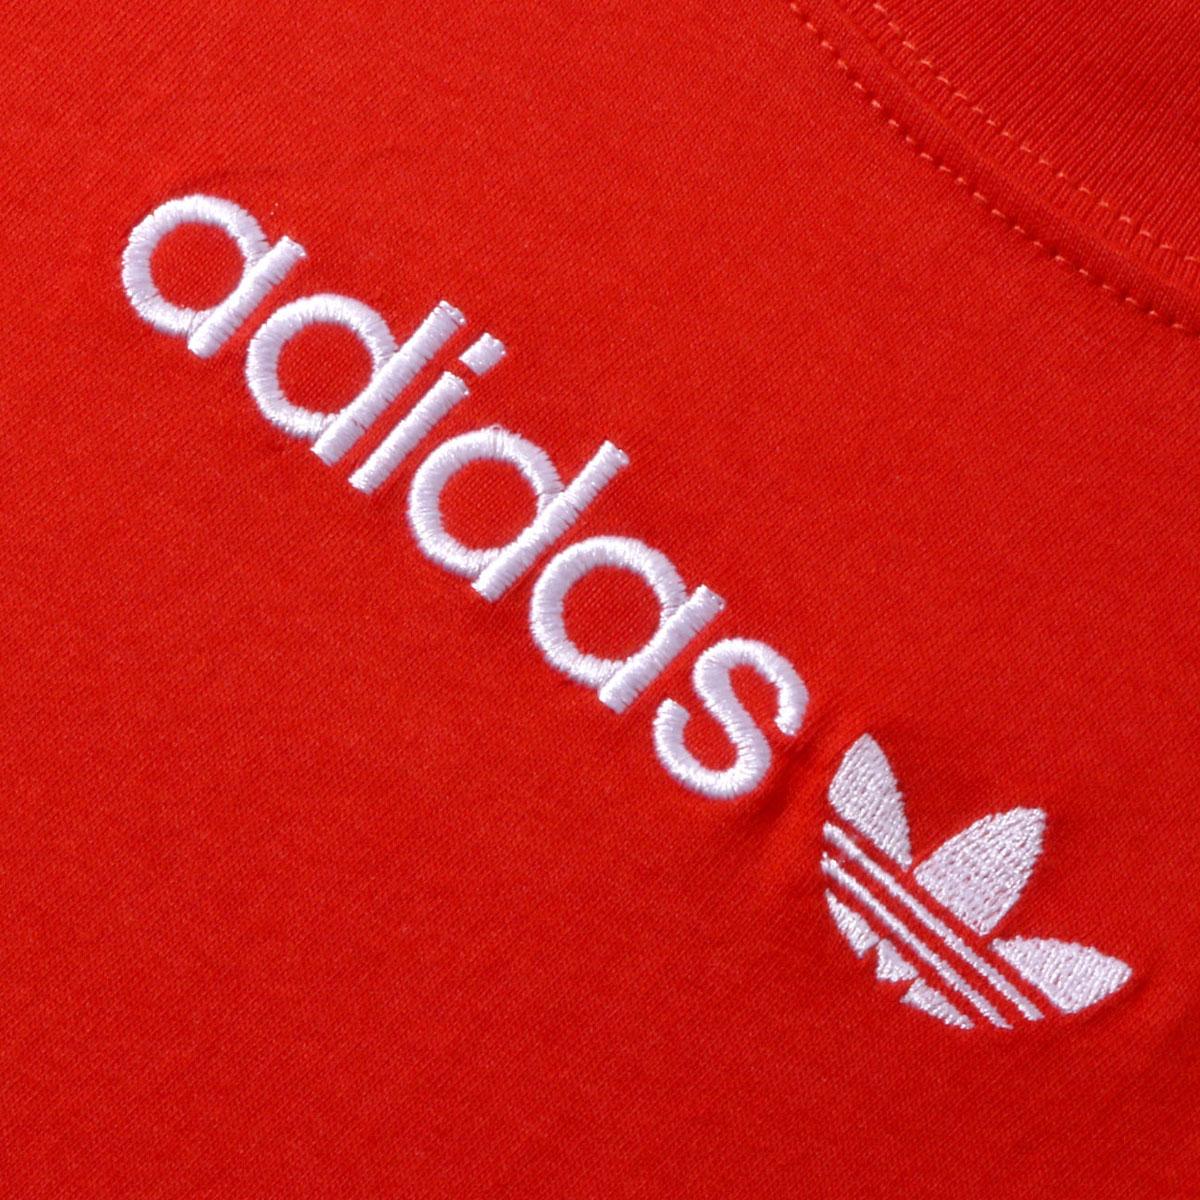 0aa15aa13a ... adidas Originals COEEZE LS TEE (ACTIVE RED) (Adidas originals COEEZE LS  tea) ...